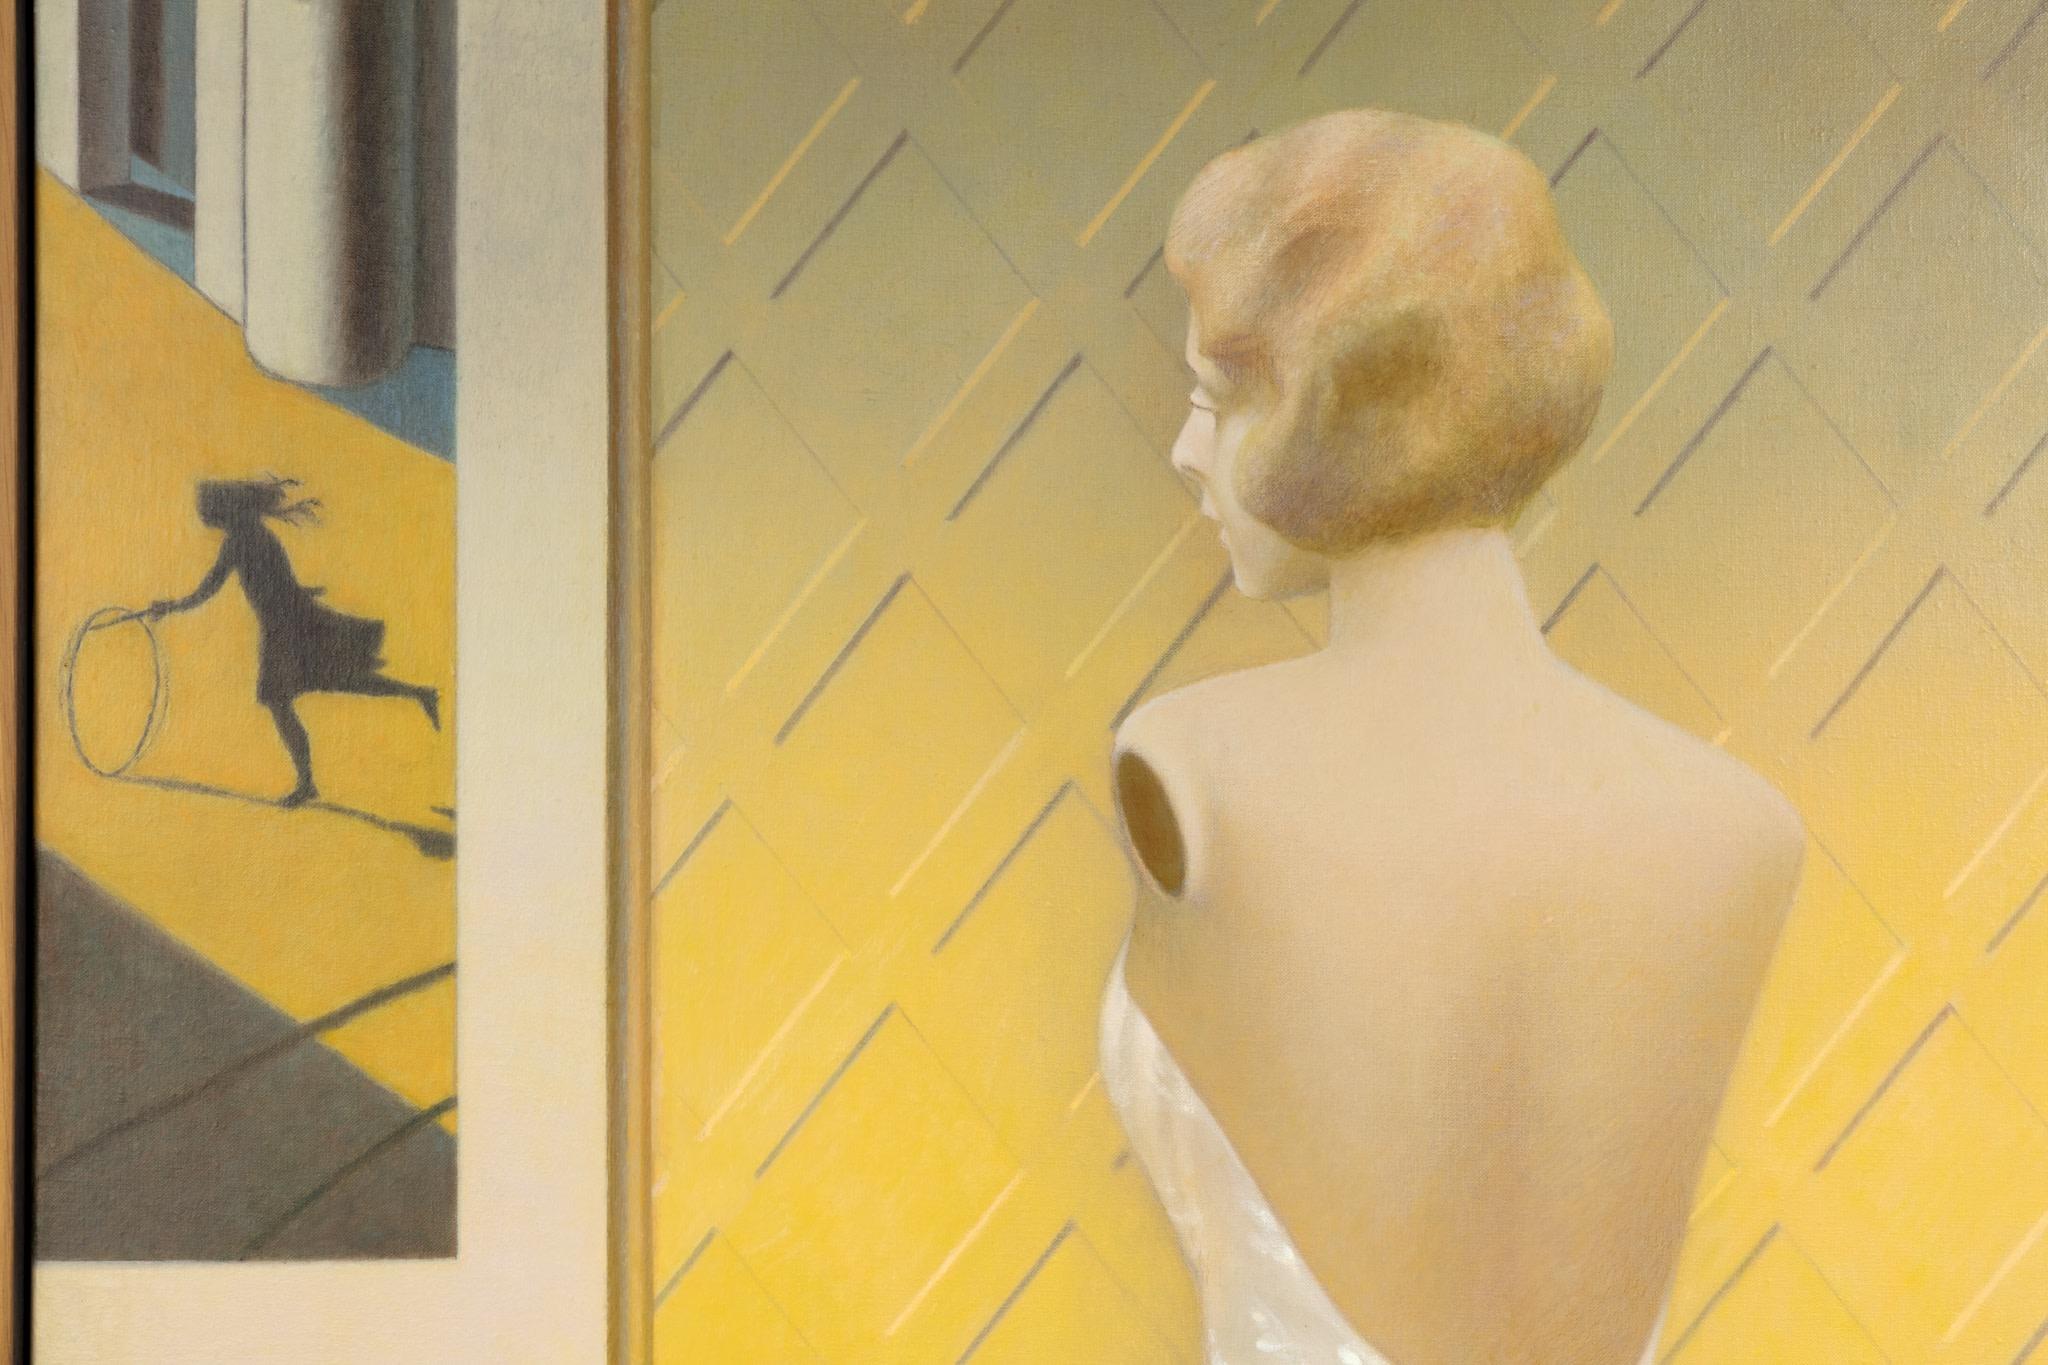 Detail: Almut Heise, Schaufenster, 2016, oil on canvas, 150,2 x 100,3 cm (59 1/8 x 39 3/8 in) (unframed), 153 x 103 x 5 cm (60 1/4 x 40 1/2 x 2 in) (framed). Photo © Andrea Rossetti